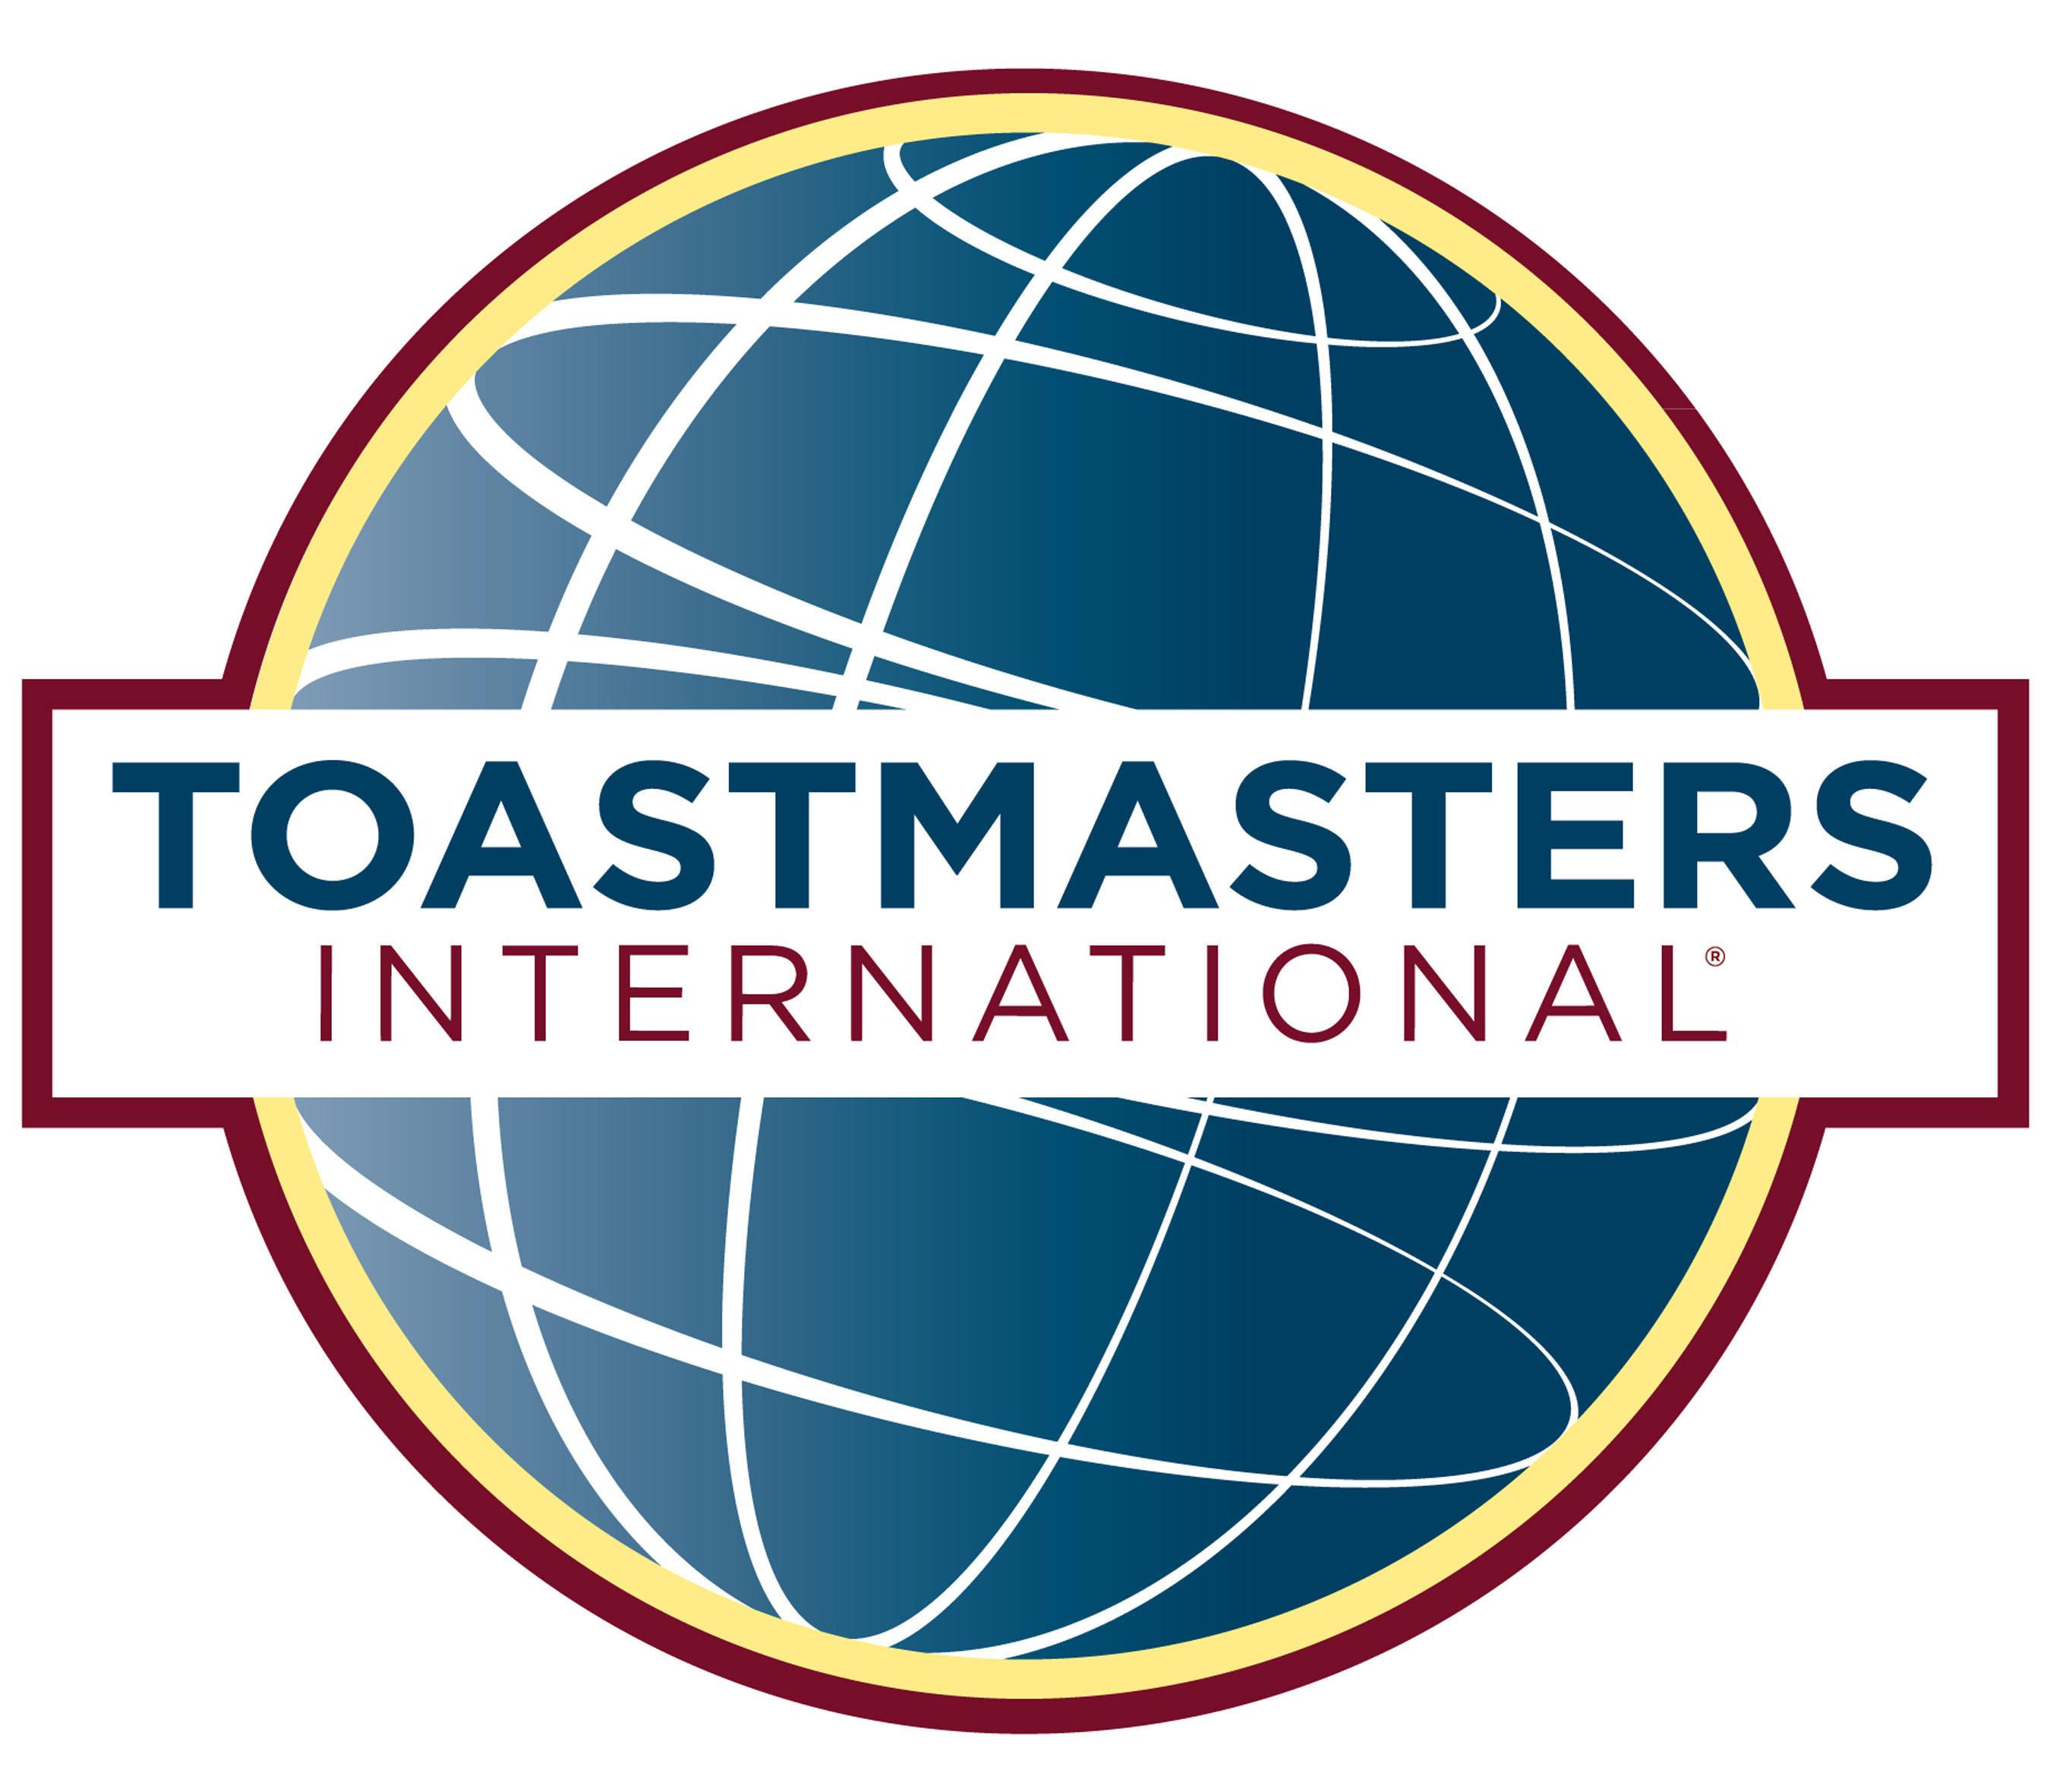 Toastmasters International LOGO.